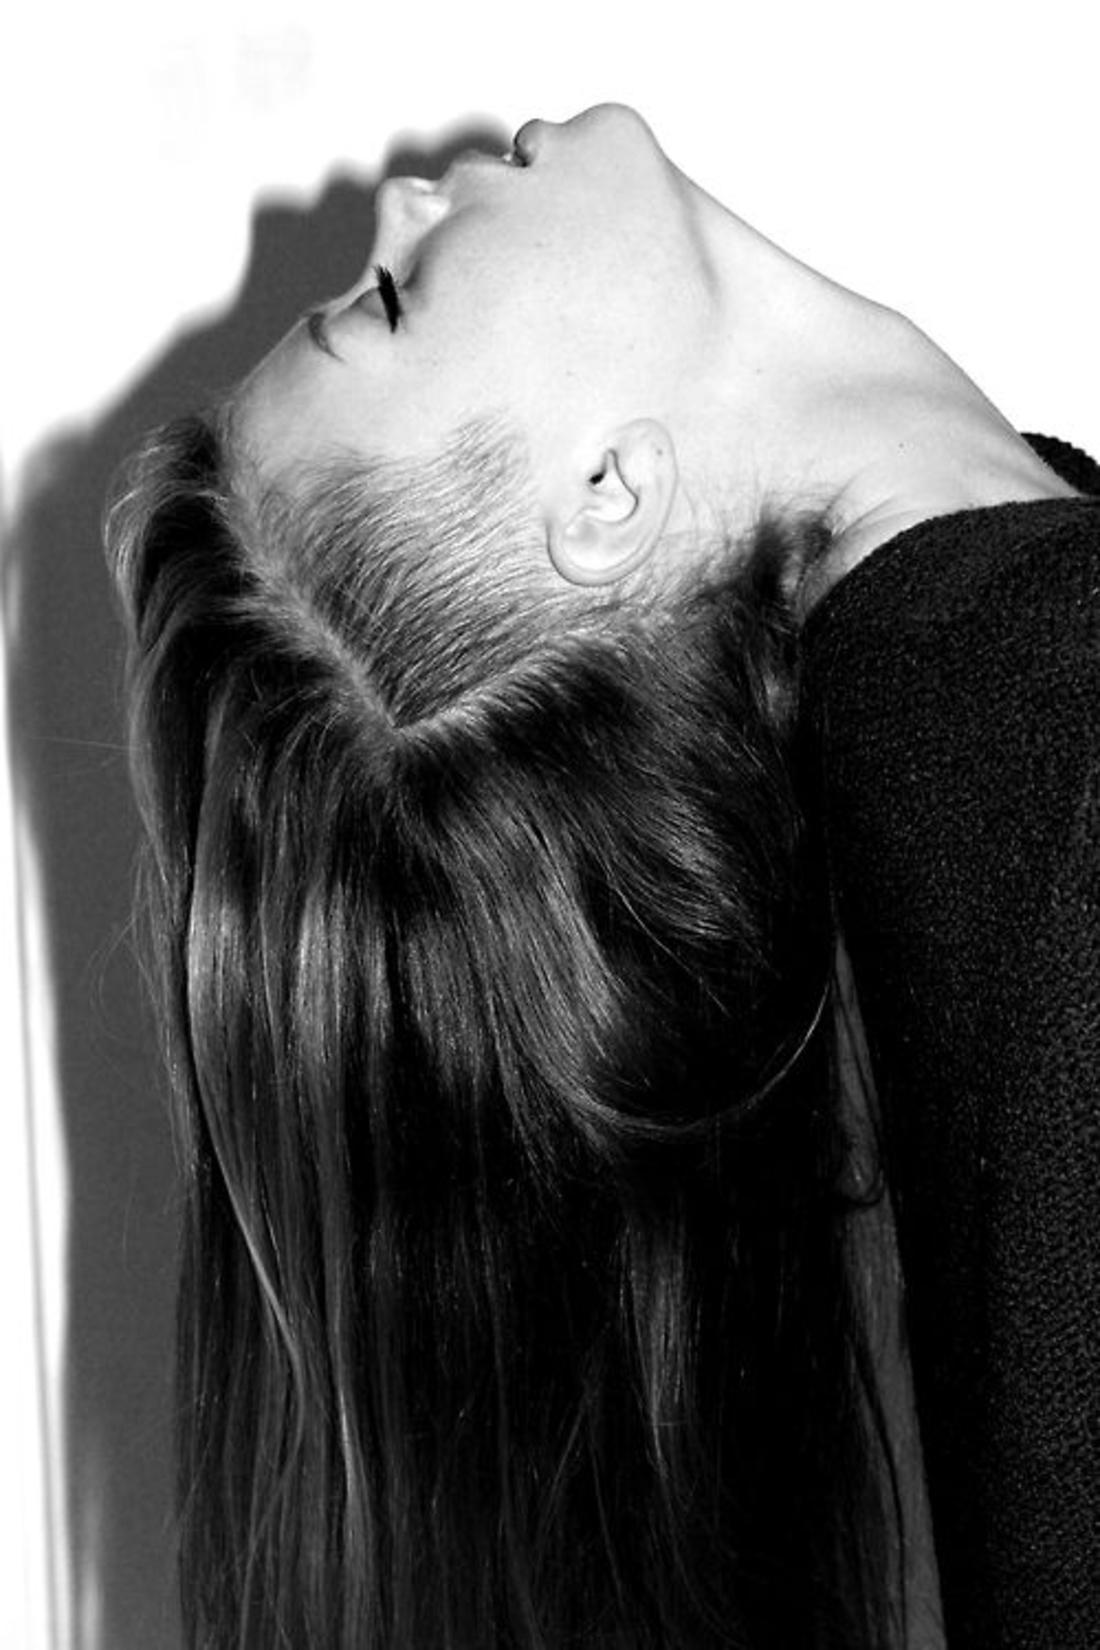 schwarz-weißes Foto Undercut Frisur lange Haare wie Dreieck geschnitten